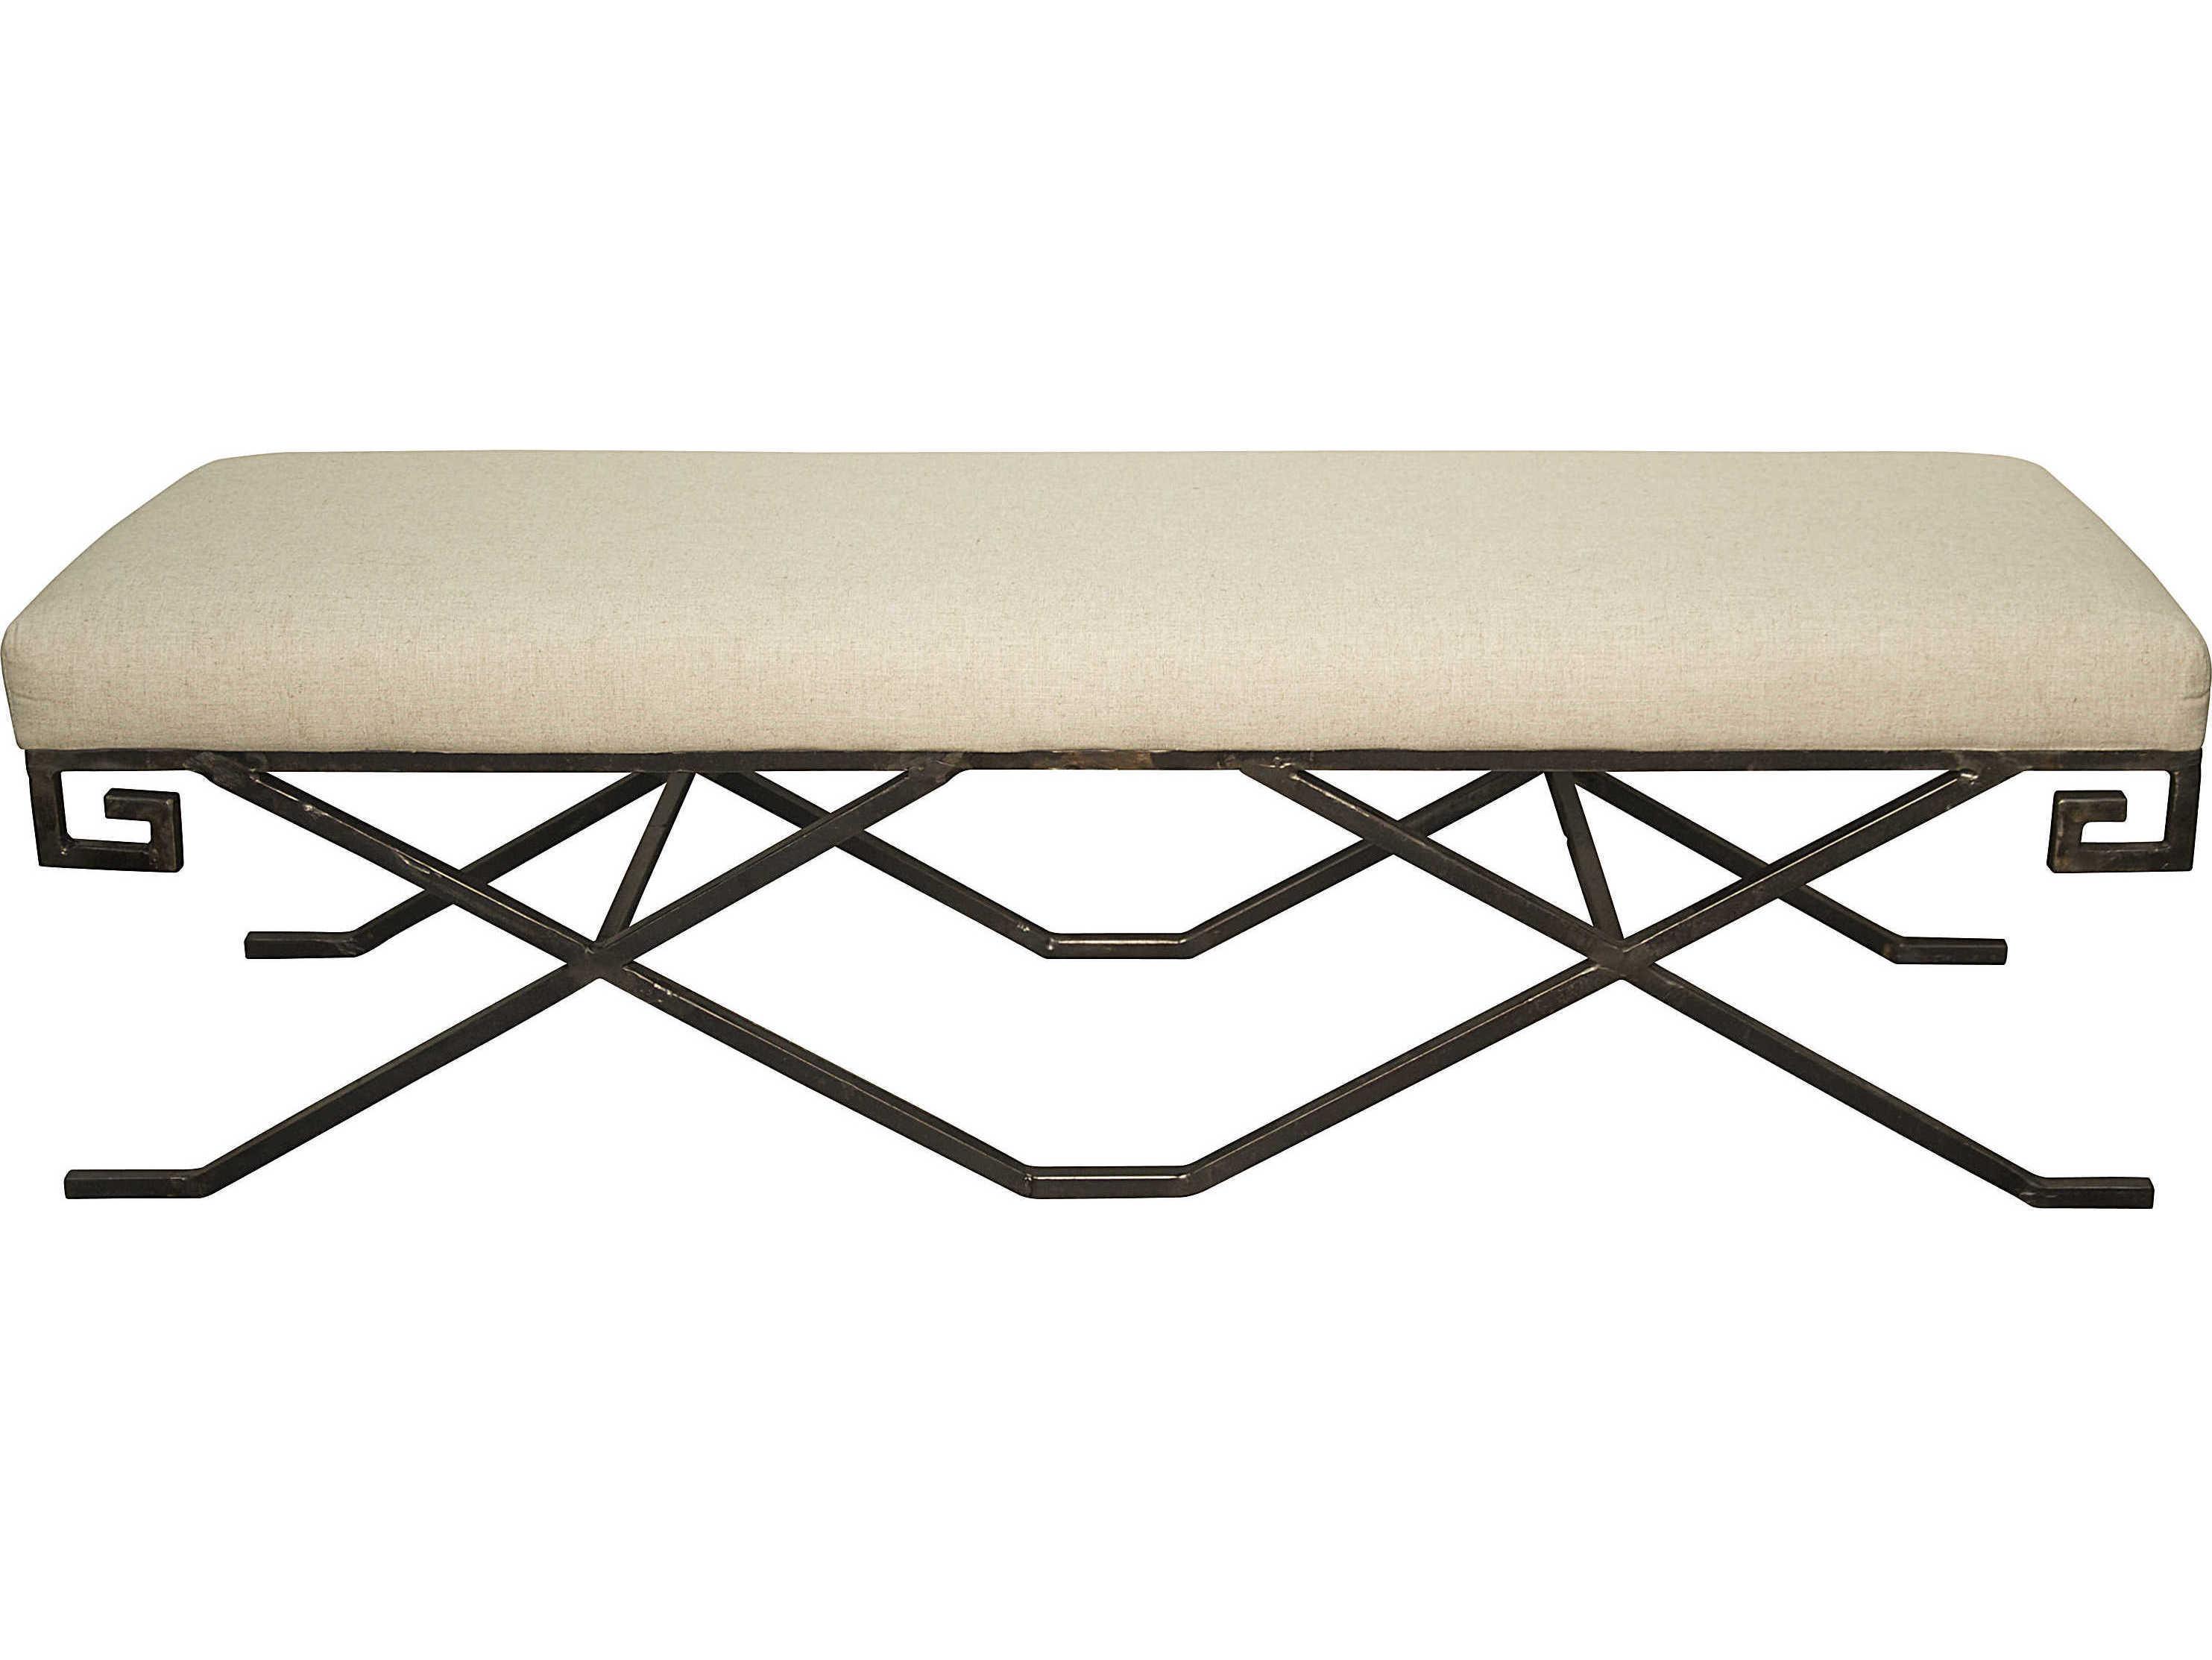 Noir Furniture Living Room Accents Metal / Light Linen Accent Bench